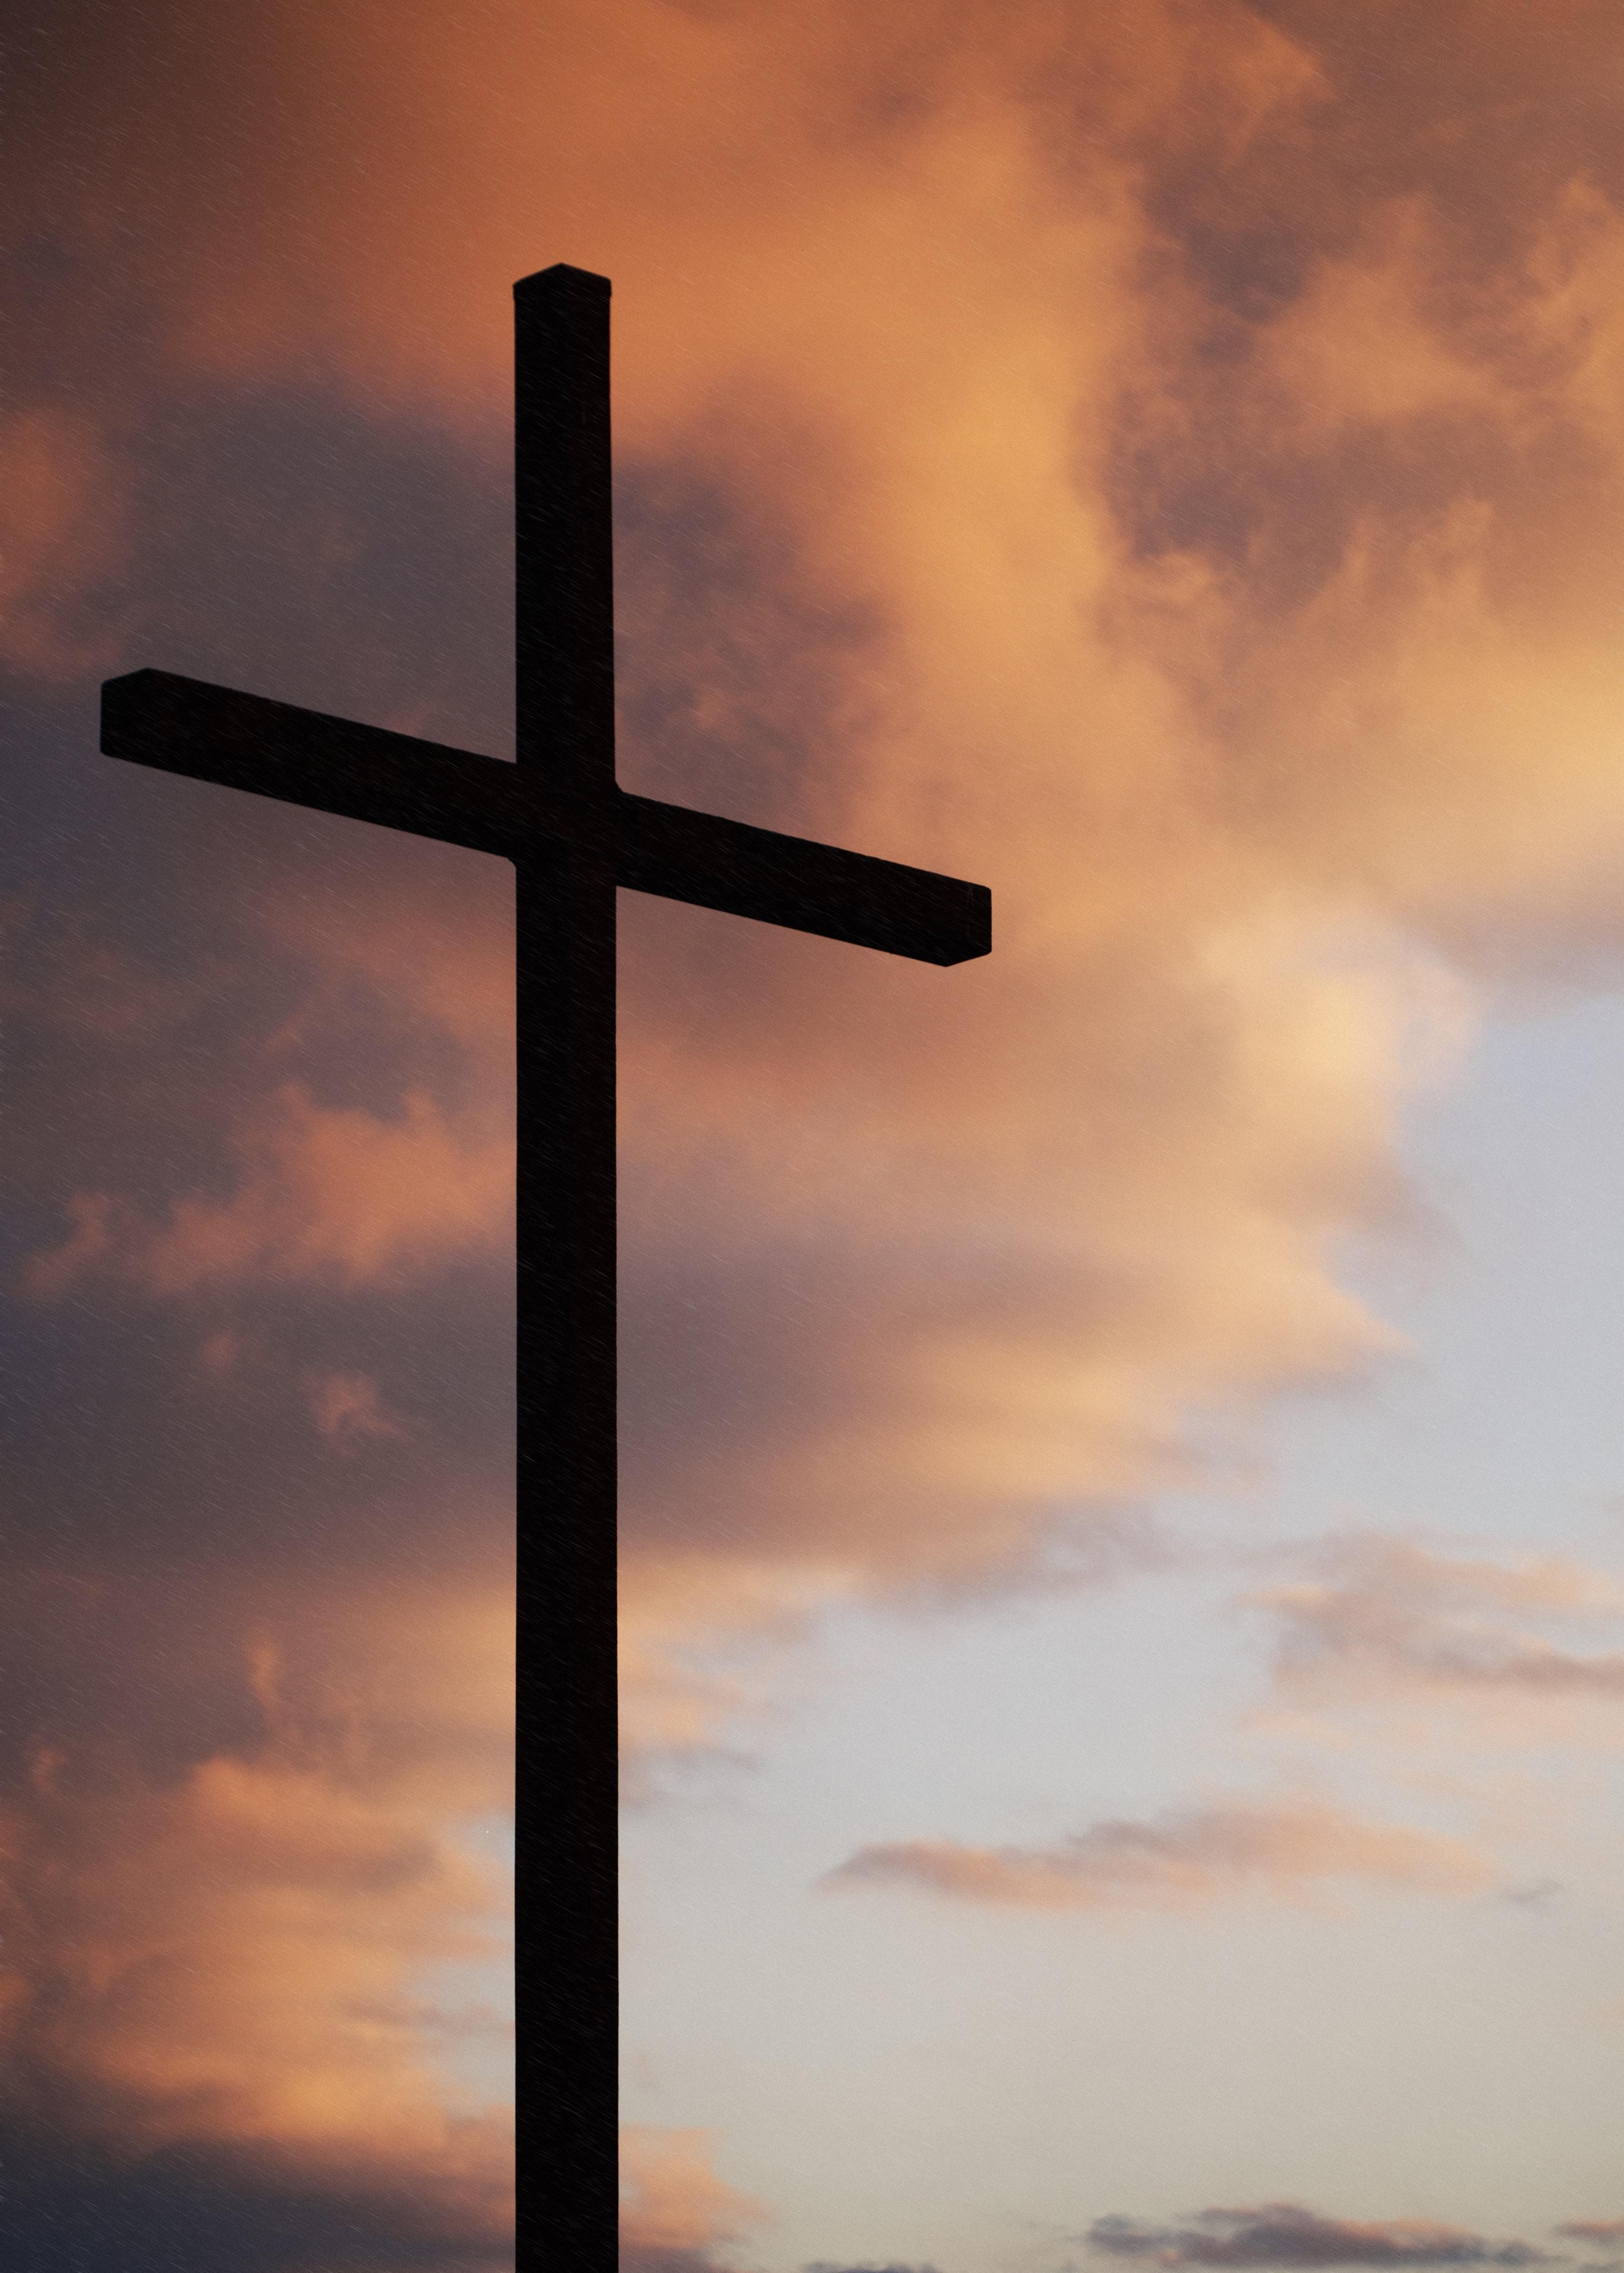 silhouette of large cross under orange sky